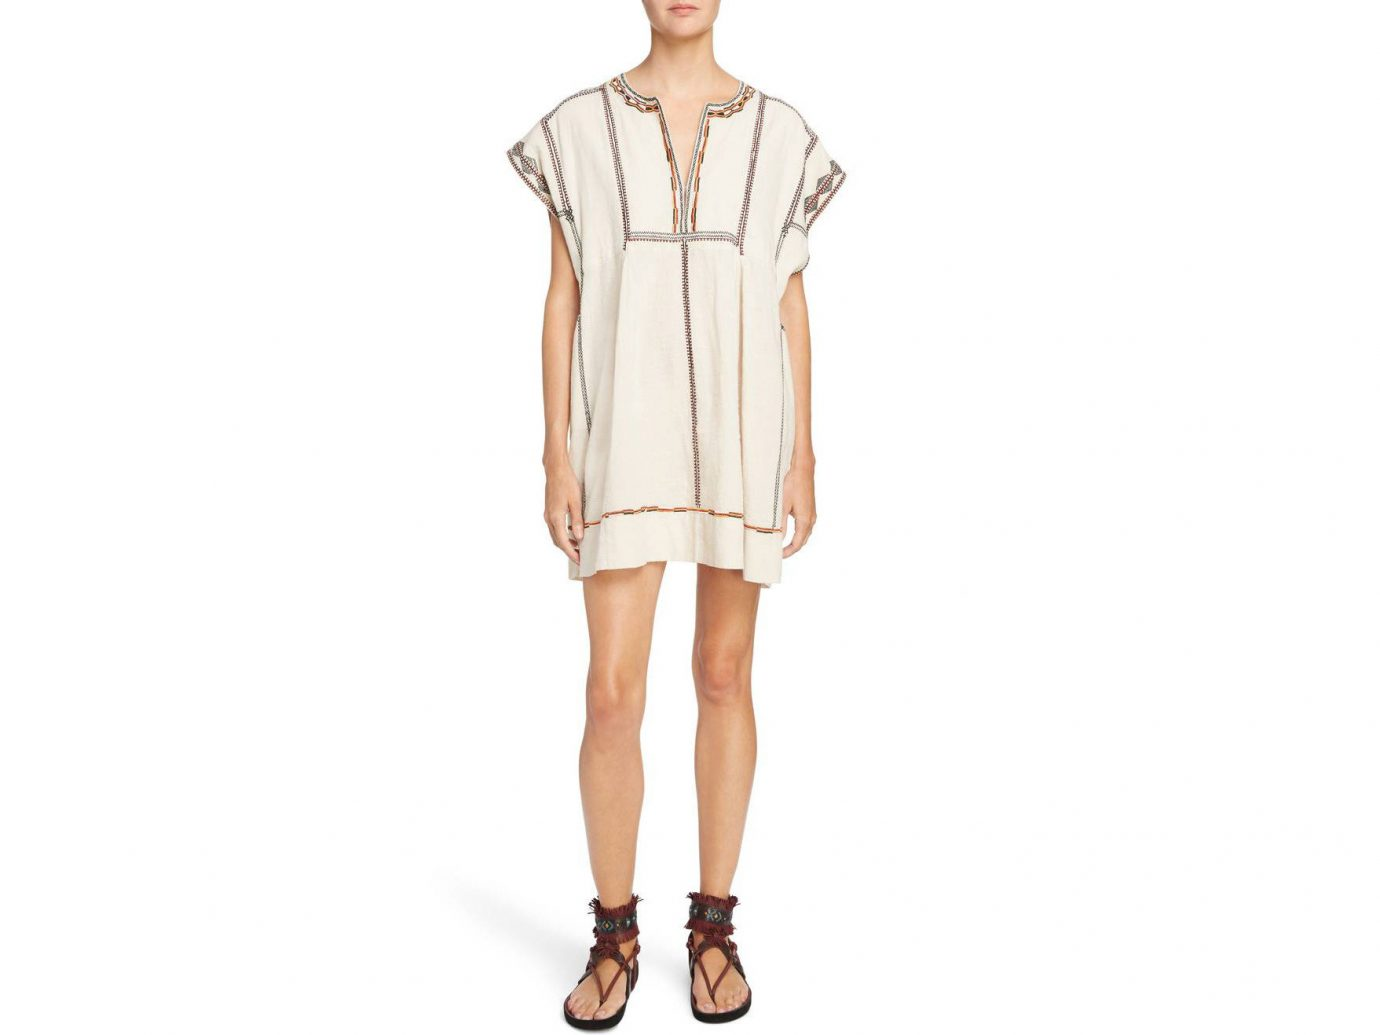 Spring Travel Style + Design Summer Travel Travel Lifestyle Travel Shop clothing day dress fashion model dress sleeve outerwear neck fashion design shoe pattern